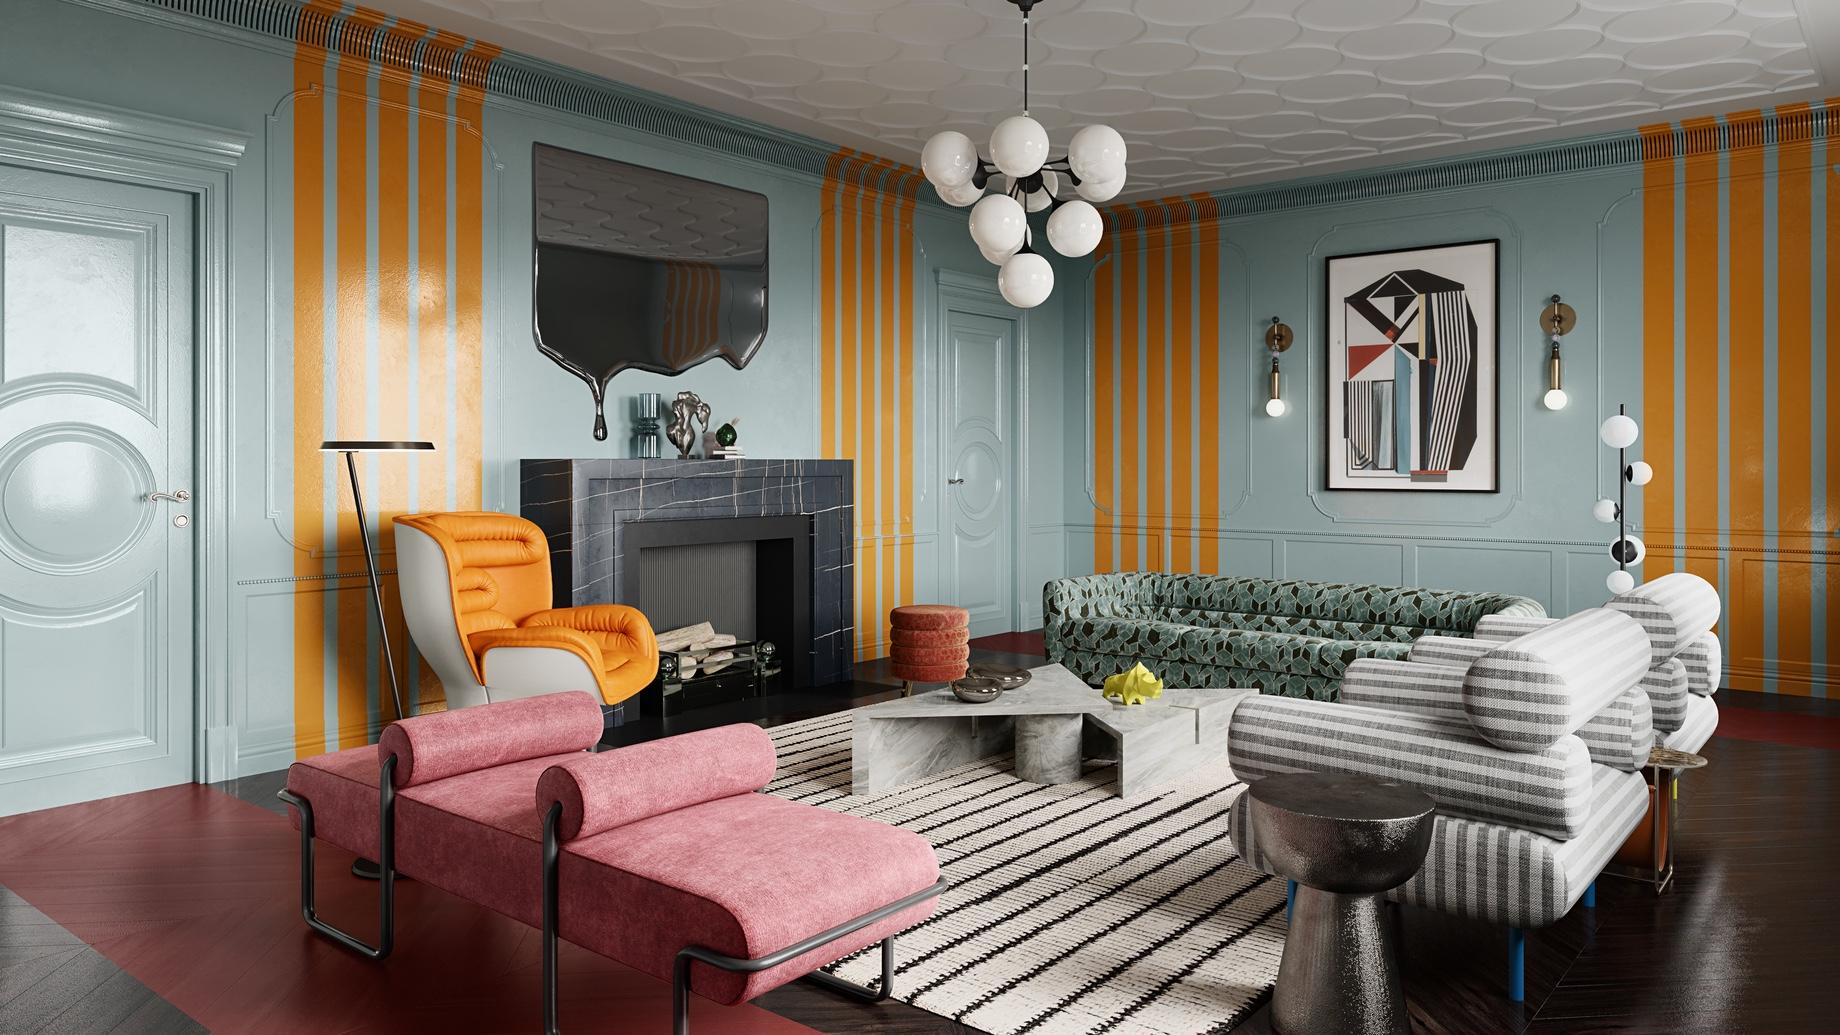 Statement Decor Pieces - Top 6 Interior Design Trends for Luxury Living in California